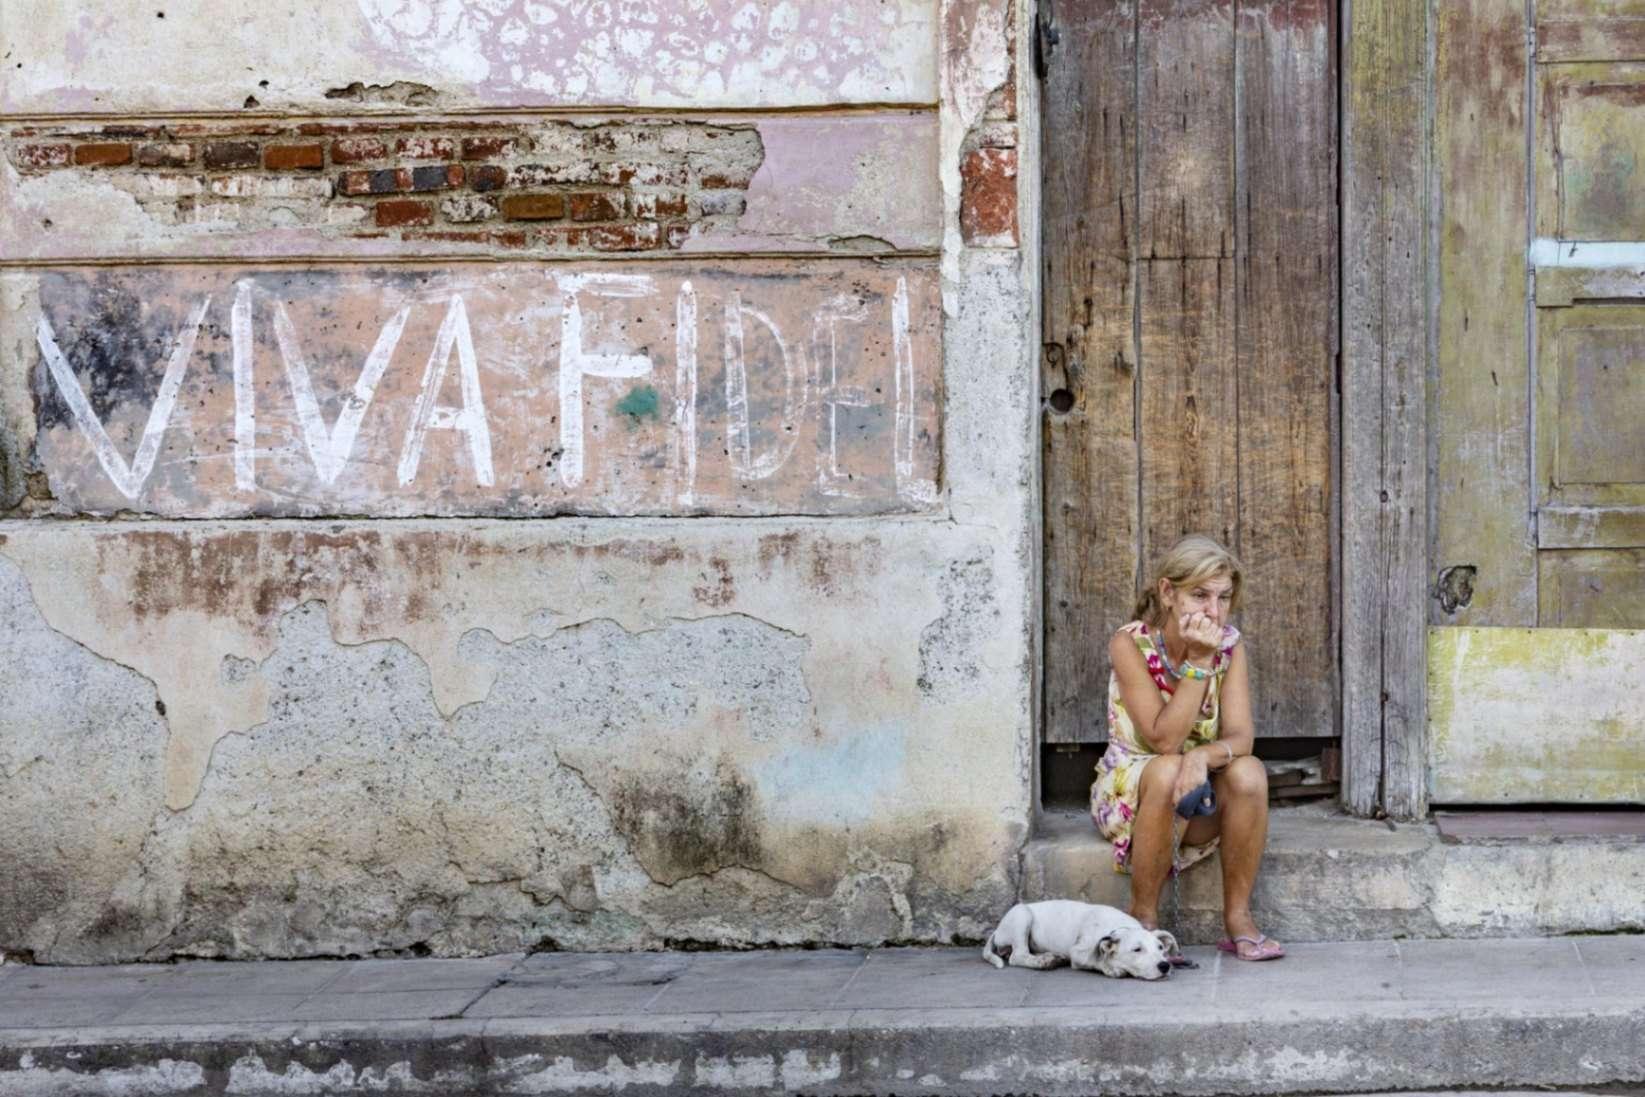 Obra: Cuba, after the Soviet Union 02